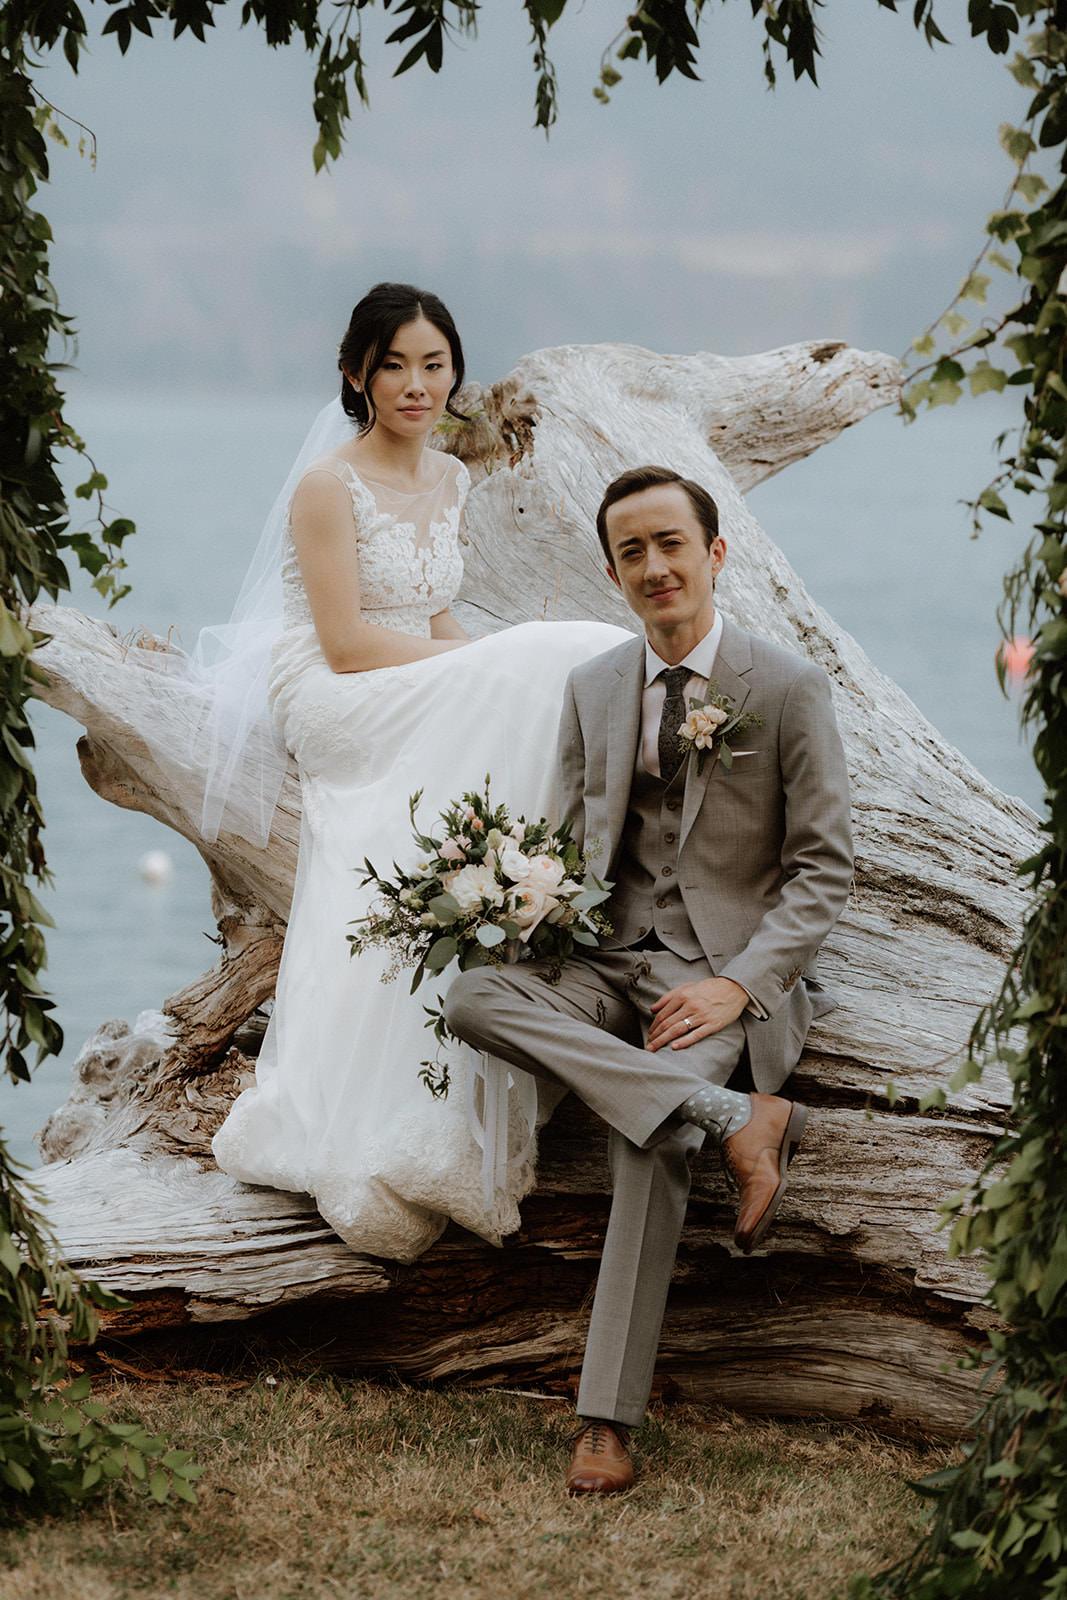 Newlyweds at Rustic Anvil Island Wedding Tomasz Wagner Photography BC Wedding Magazine